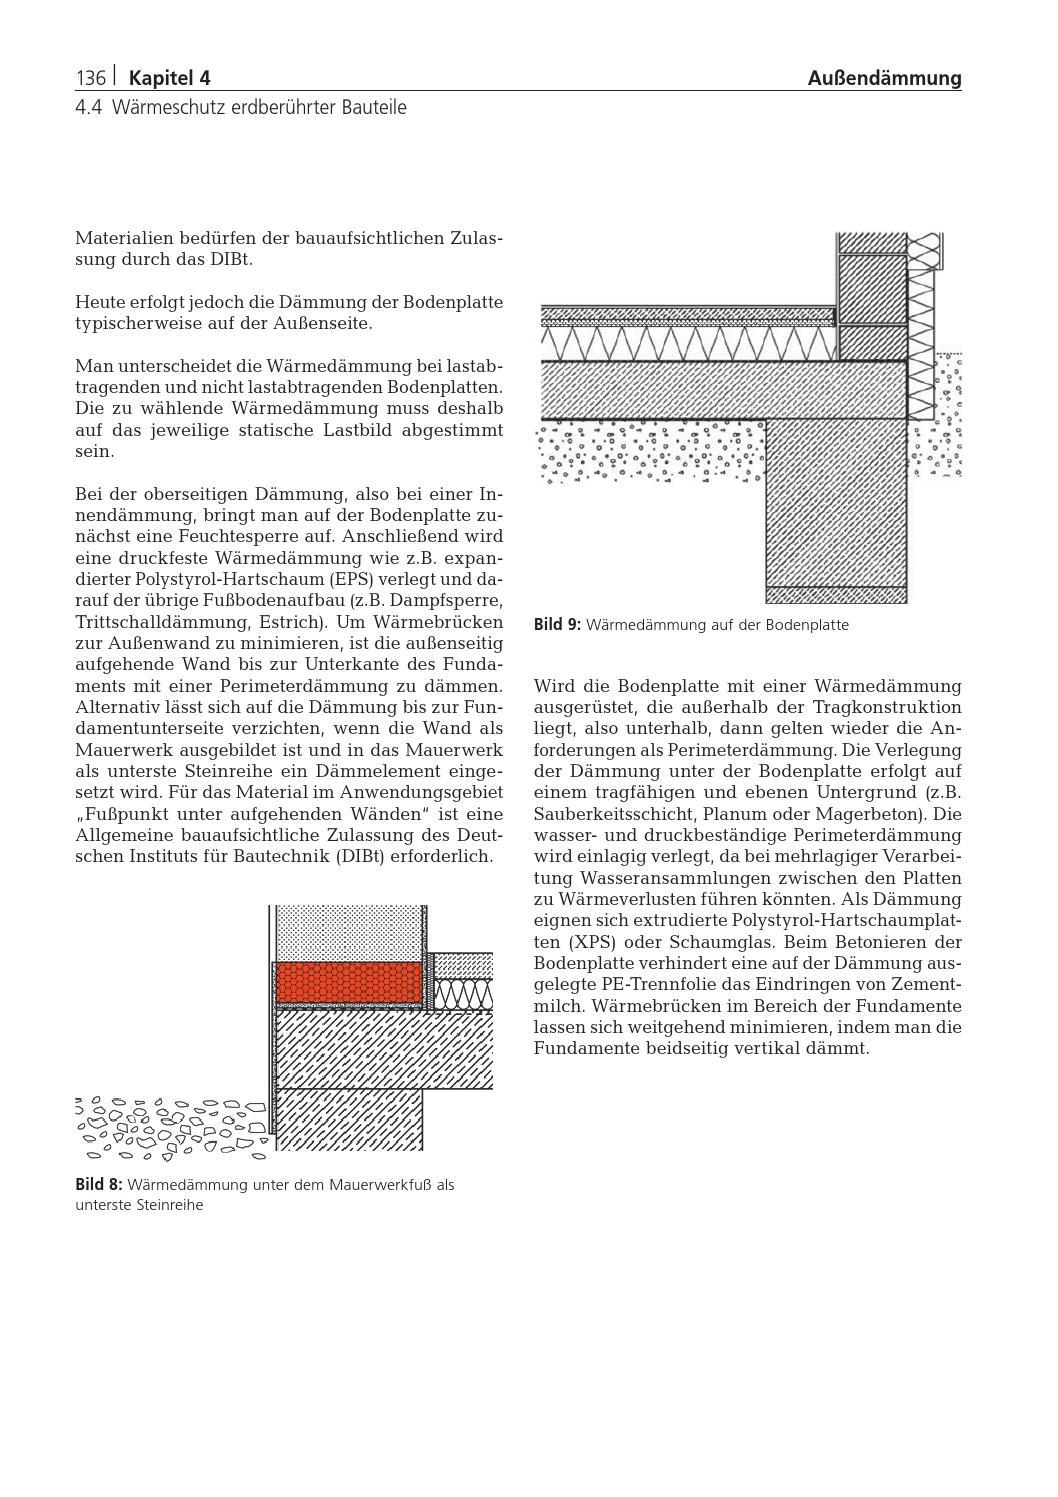 Dammung Konstruktion Bauphysik Umsetzung By Detail Issuu